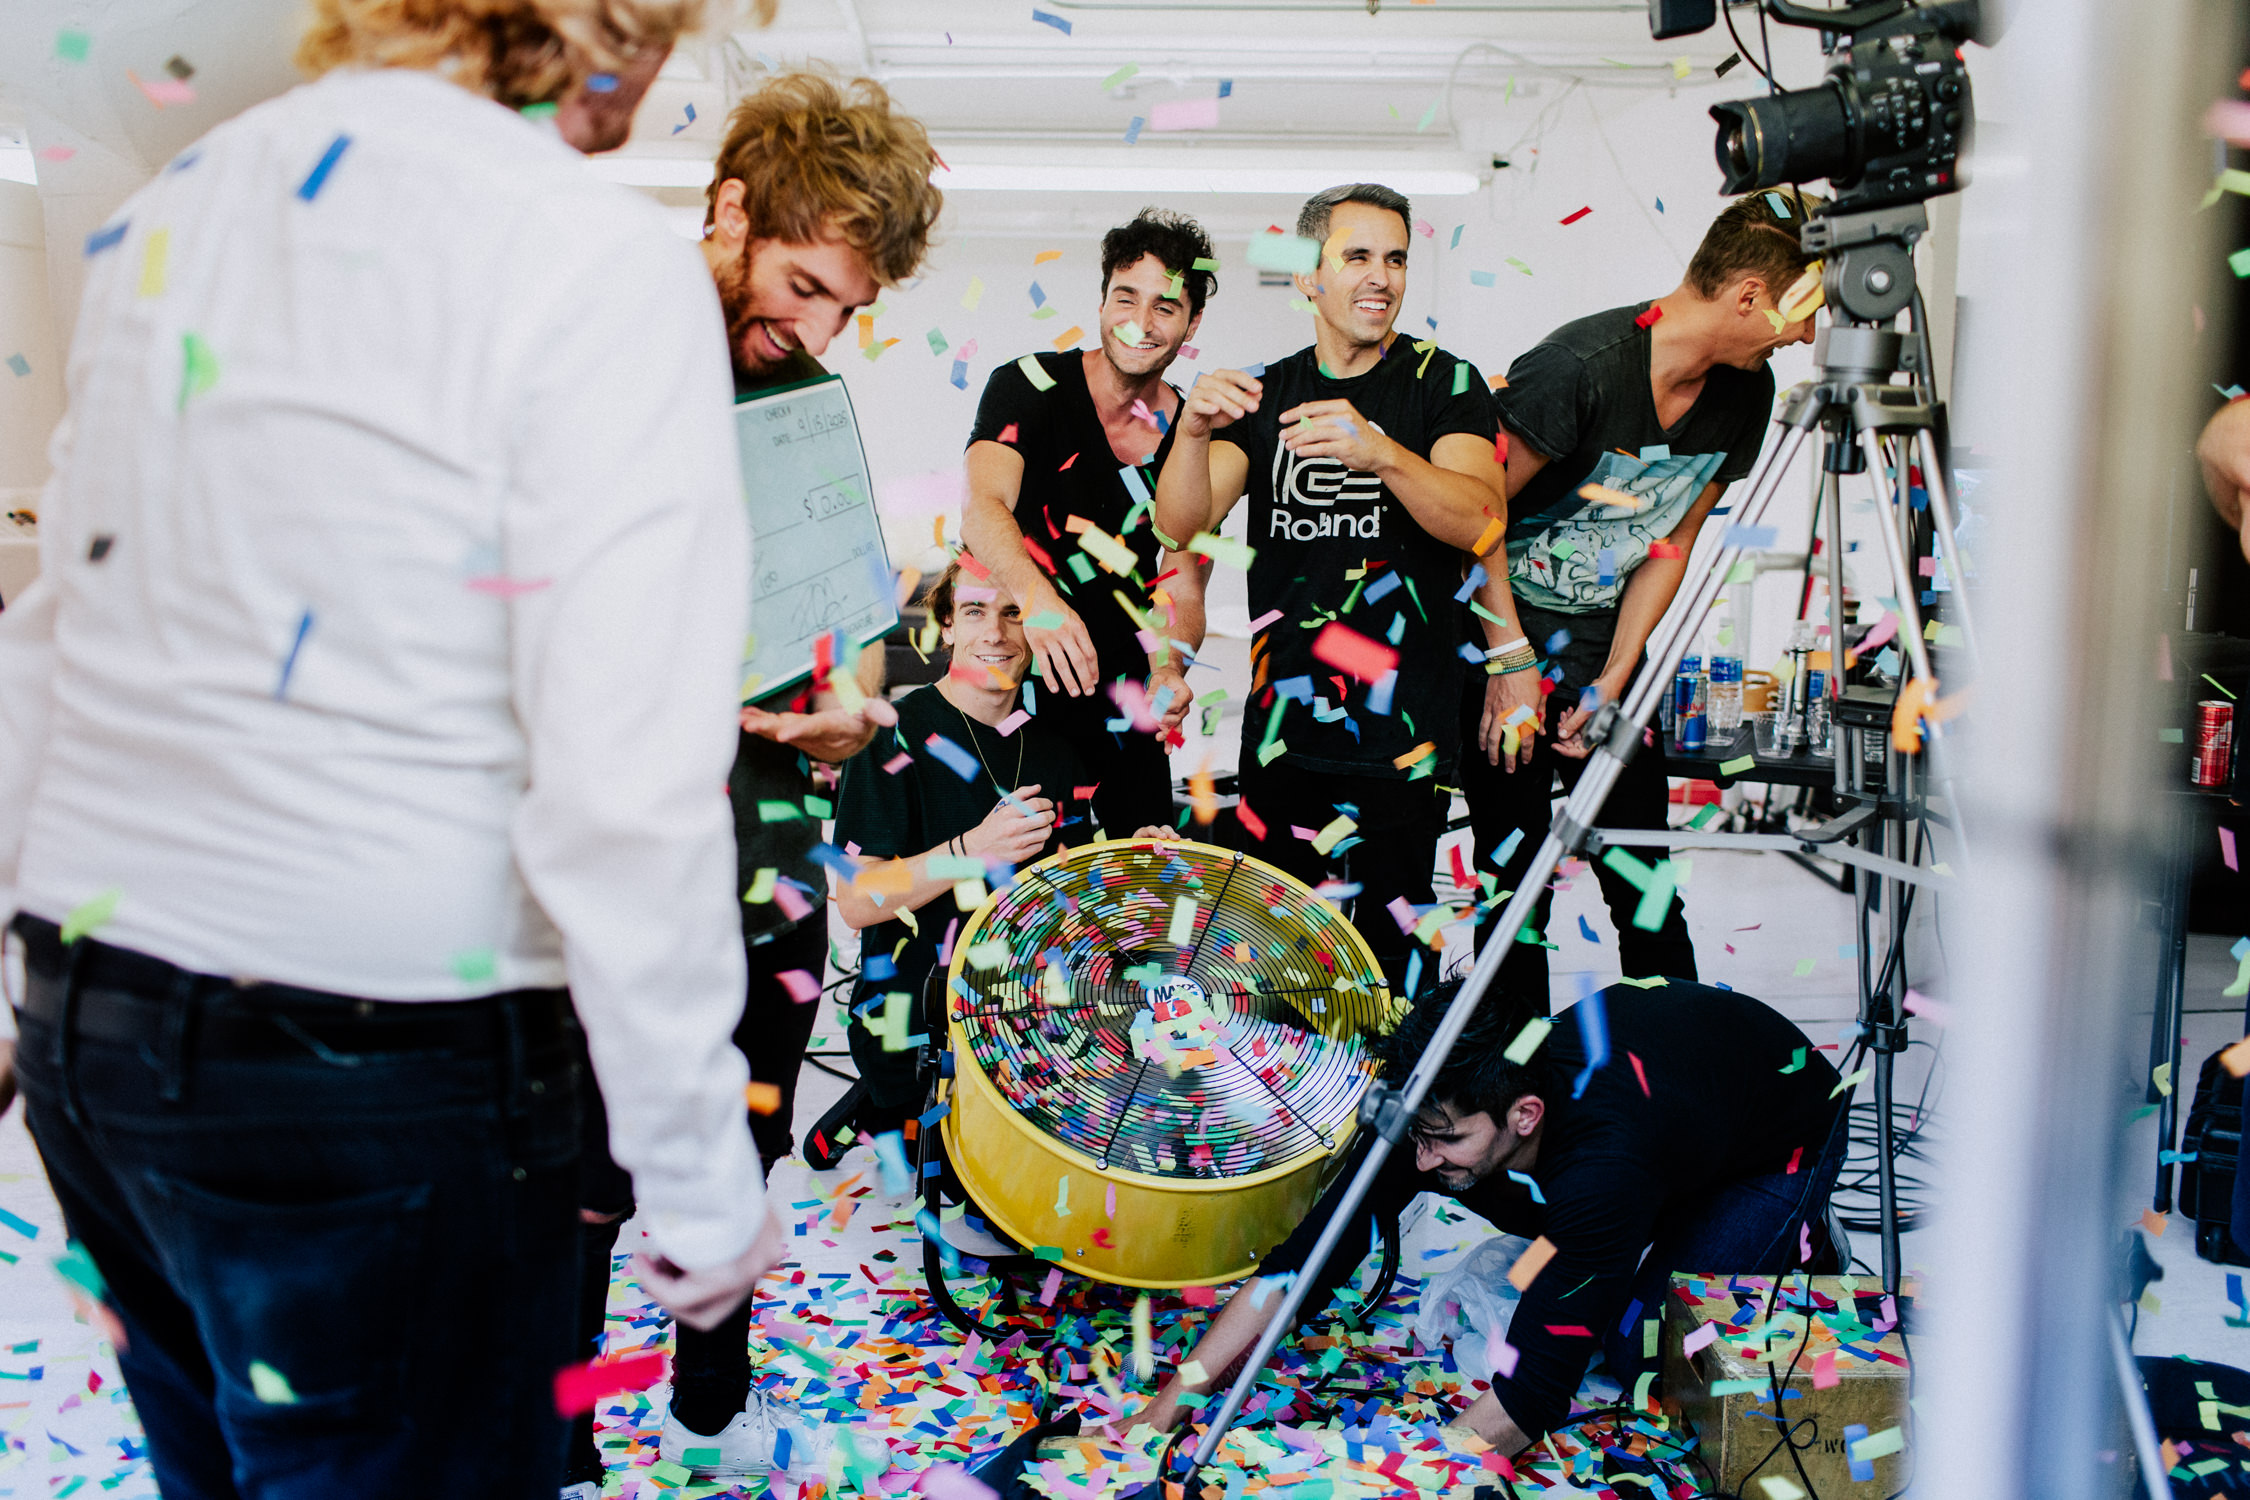 smallpools-confetti-music-video-bts-AnnaLeeMedia